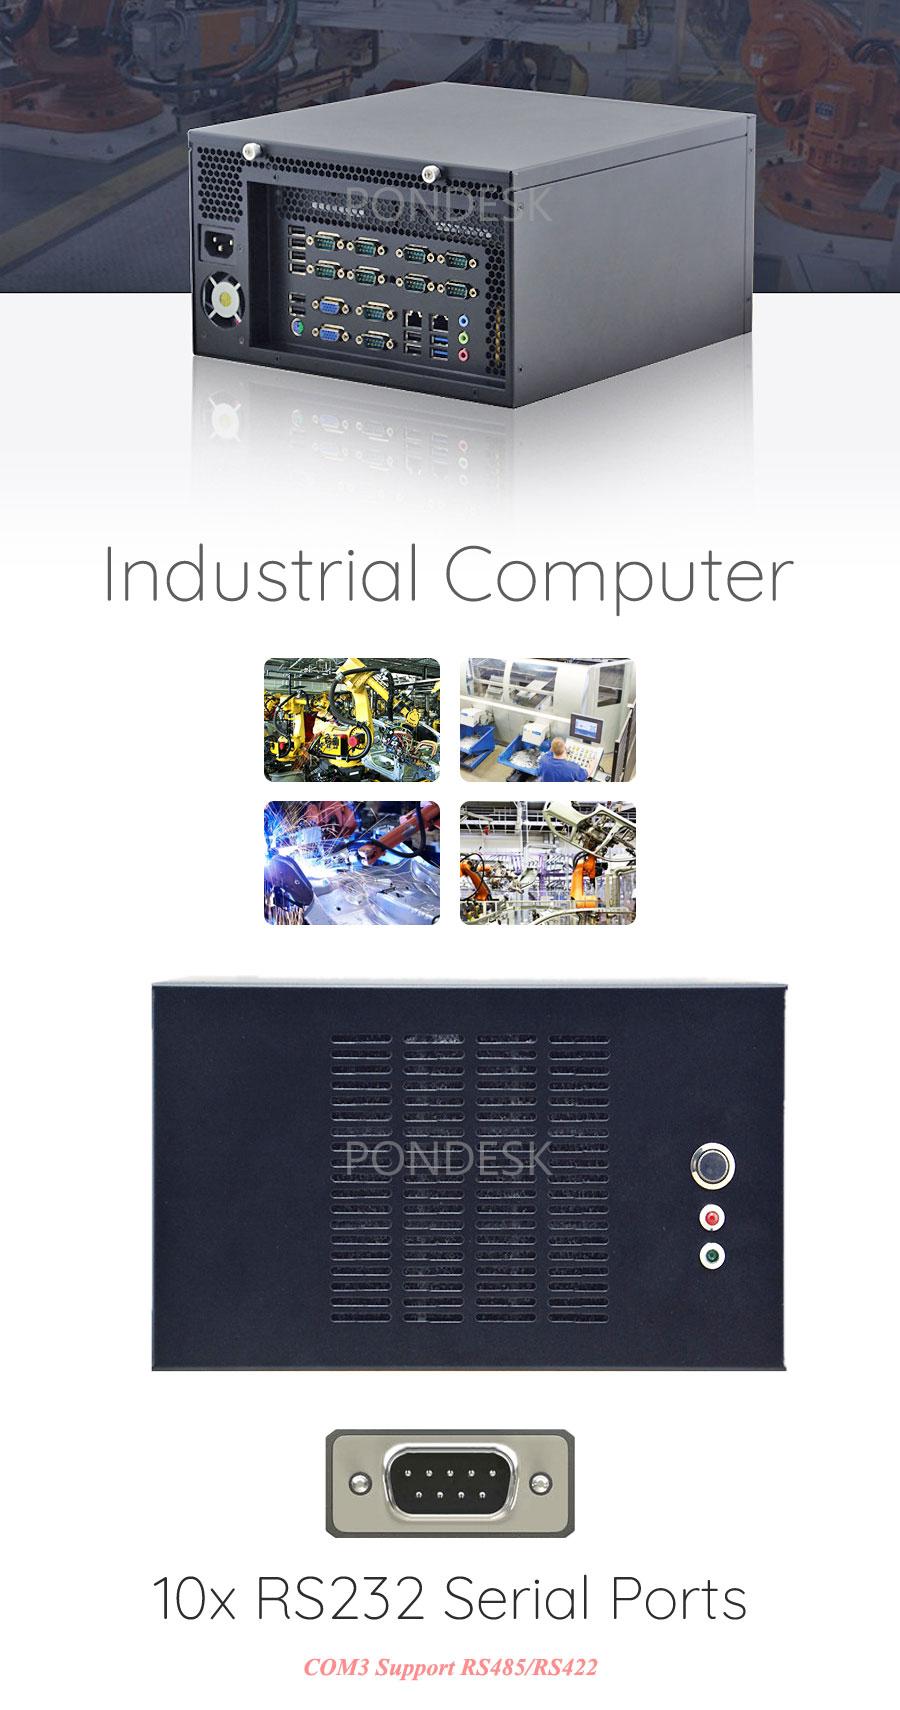 Intel® Haswell i3/i5/i7 HD 10 COM 2 LAN Industrial Computer - MNHO-071 | Image